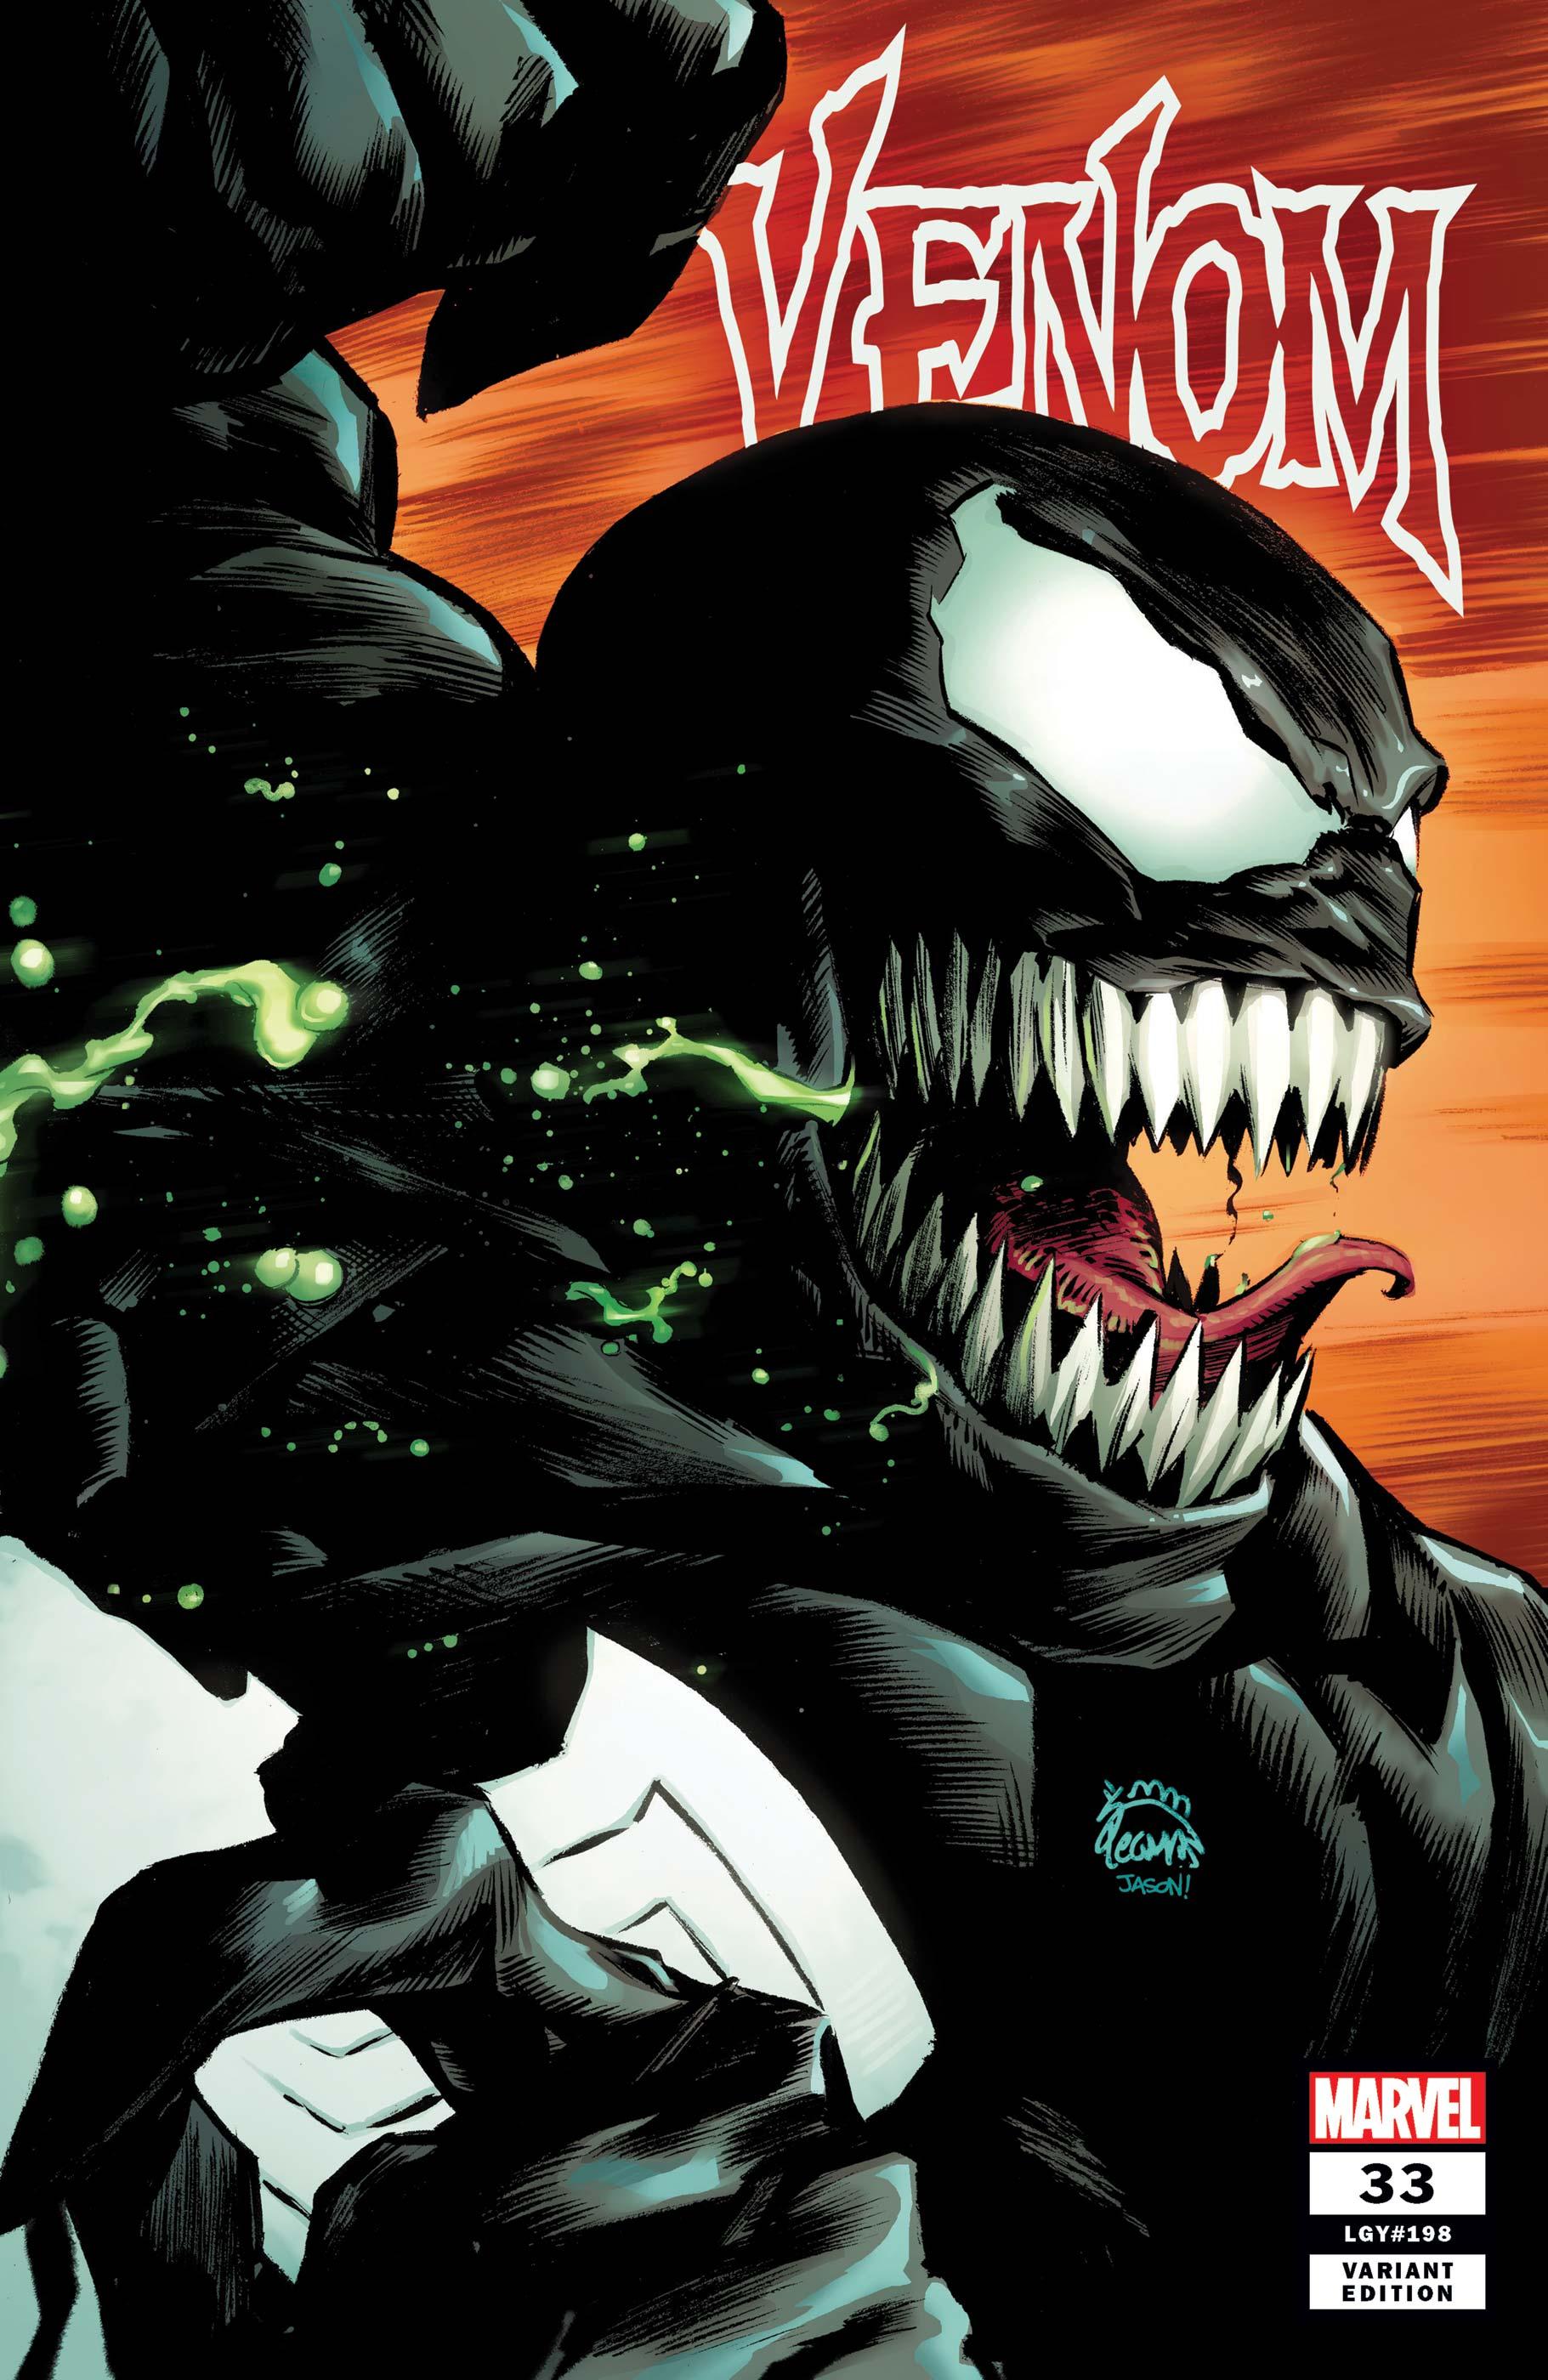 Venom (2018) #33 (Variant)